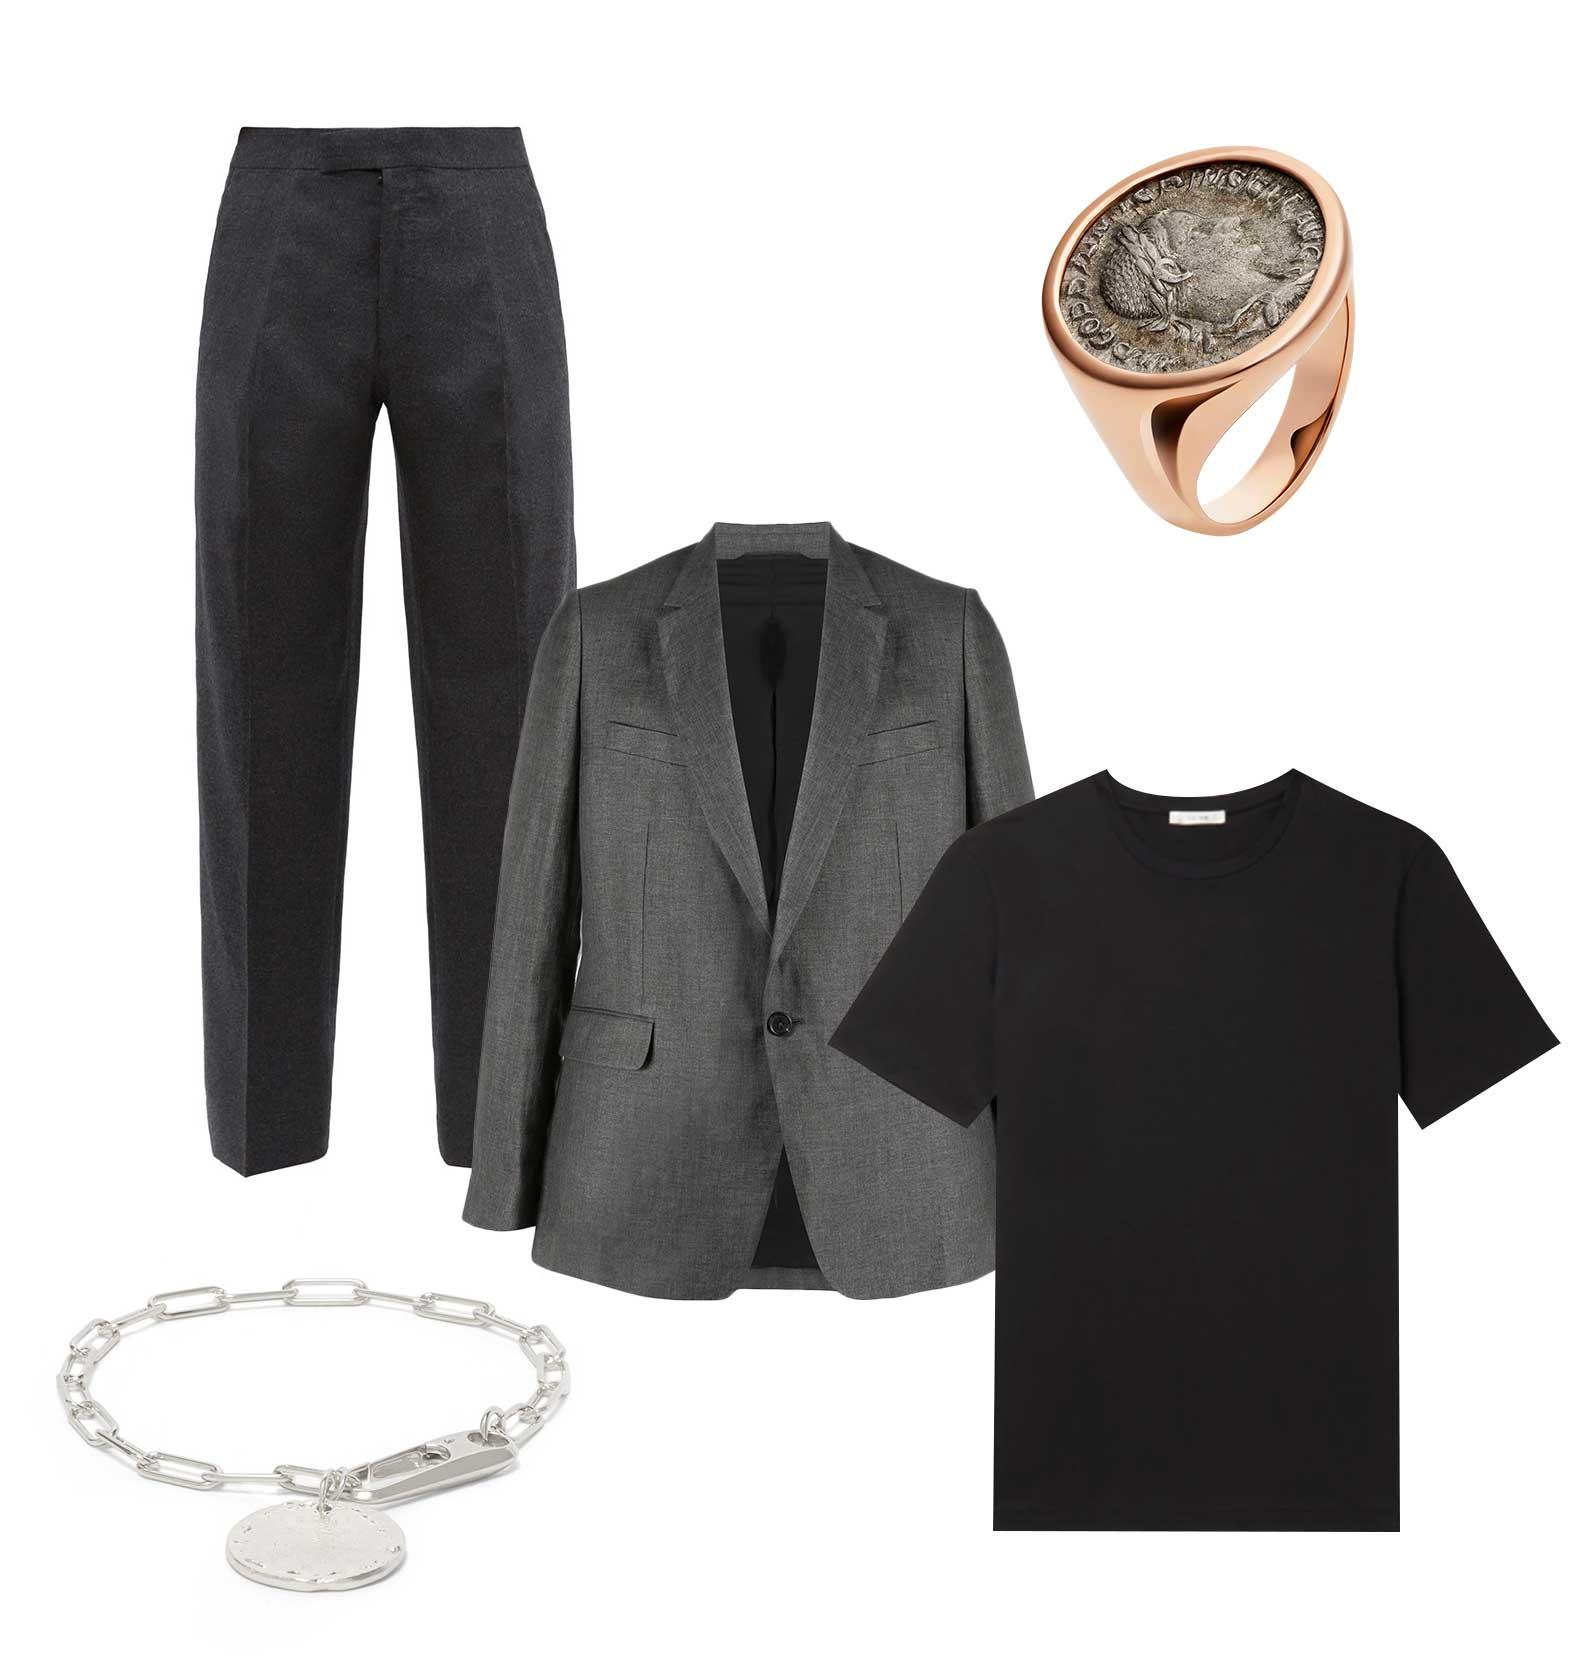 Пиджак Ann Demeulemeester, 55 875 рублей; футболка The Row, £275; брюки The Row, €1188; перстень Bvlgari; браслет Alighieri, €214